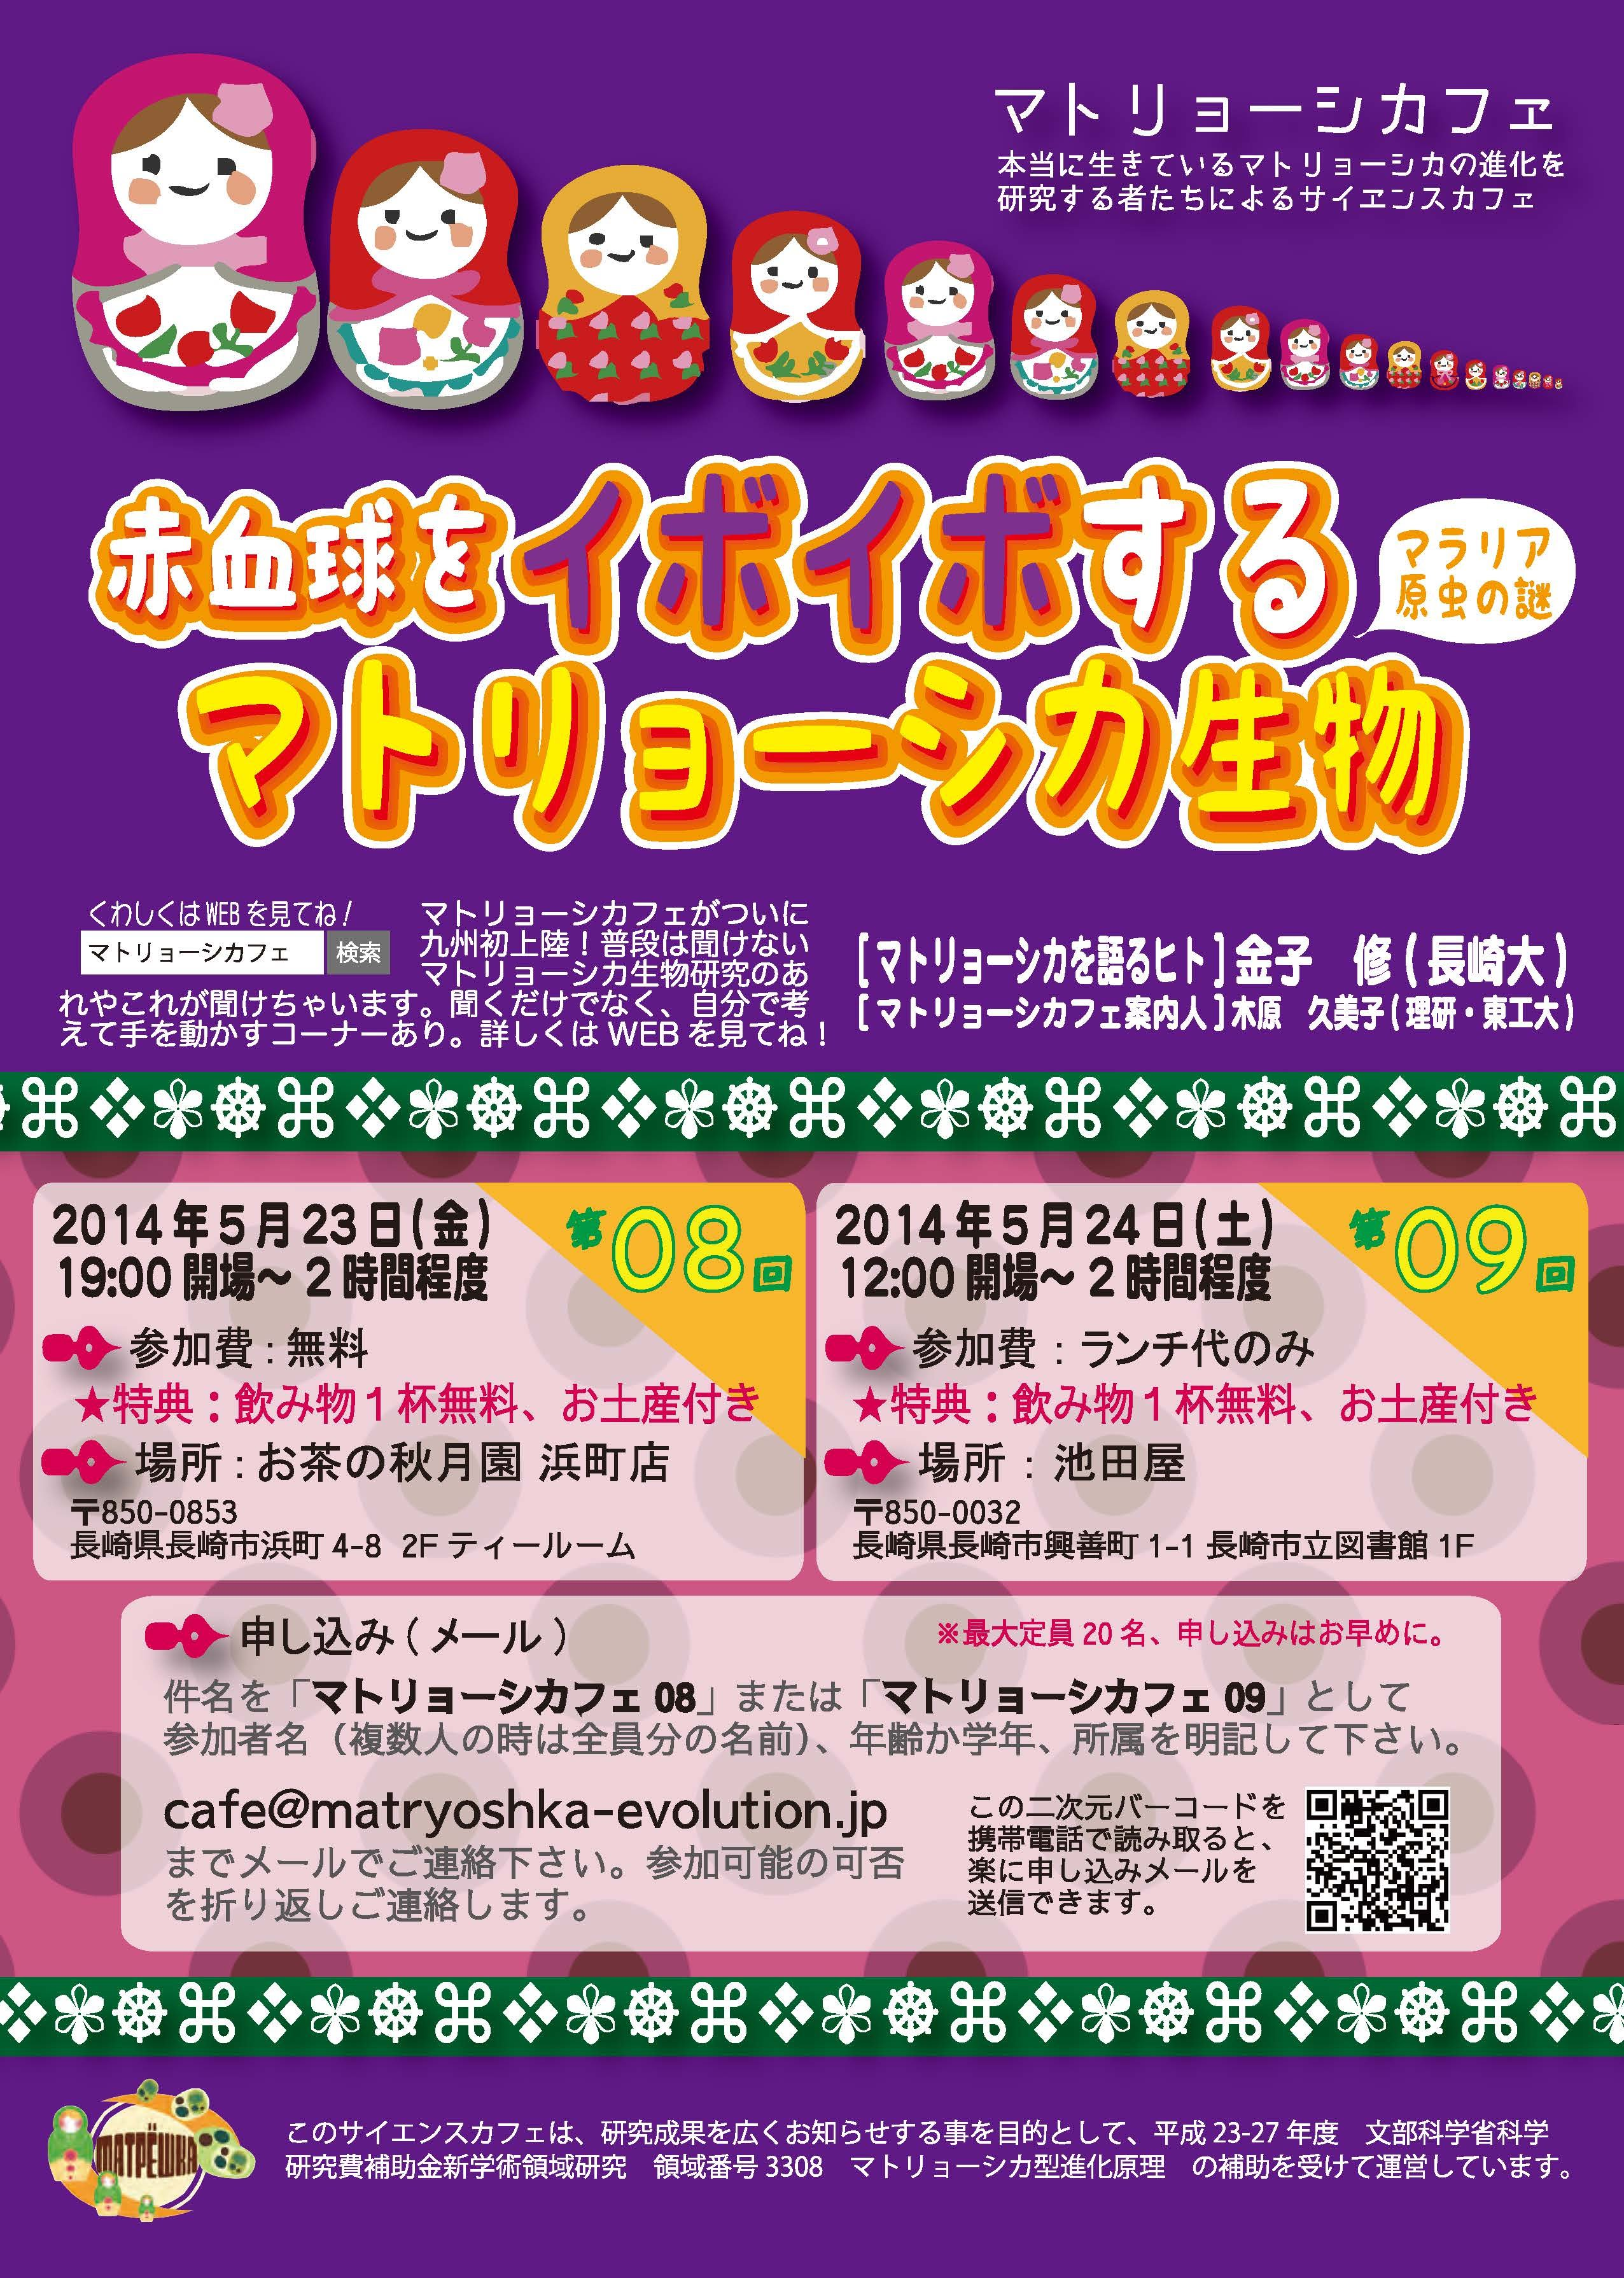 https://3d10e7f3-a-127f7e68-s-sites.googlegroups.com/a/matryoshka-evolution.jp/matoryoshikafe/matoryoshikafe-kai-cui-qing-bao/20140523_ちらしmcafe08-09_ver01_out_s_test.jpg?attachauth=ANoY7cpvVGbOE3xsq2CWfCKr4gXKhz6SF_oRA_nnOpZW_knG0FupdnqAjmedcIOXZ78VMJ1Zw52hbeyizagGoWAbF_QpvhHyyUDVIumyQXh8CHZhID_9EPUiMmHs-4CYabwm0JVn5ZCjW4vNeMxL6SiyIwCK0yThWPB05JZswY2bi68_X9G5I2heV_WJJt1Tcz76O1IczGdplSo9K12VfsQevyU67gGl9pma-JxbQGFpP1zH4DD4dCsad7x3vGKwSdWzEEOjWlUACmAXkAiuwGygMZgru2GdditLvaXMaEFUC807vLgQoi1X49Tt_w9bx-fQCcVUW240VE6ke-j2An8azIEejmkqng%3D%3D&attredirects=0;attredirects=0